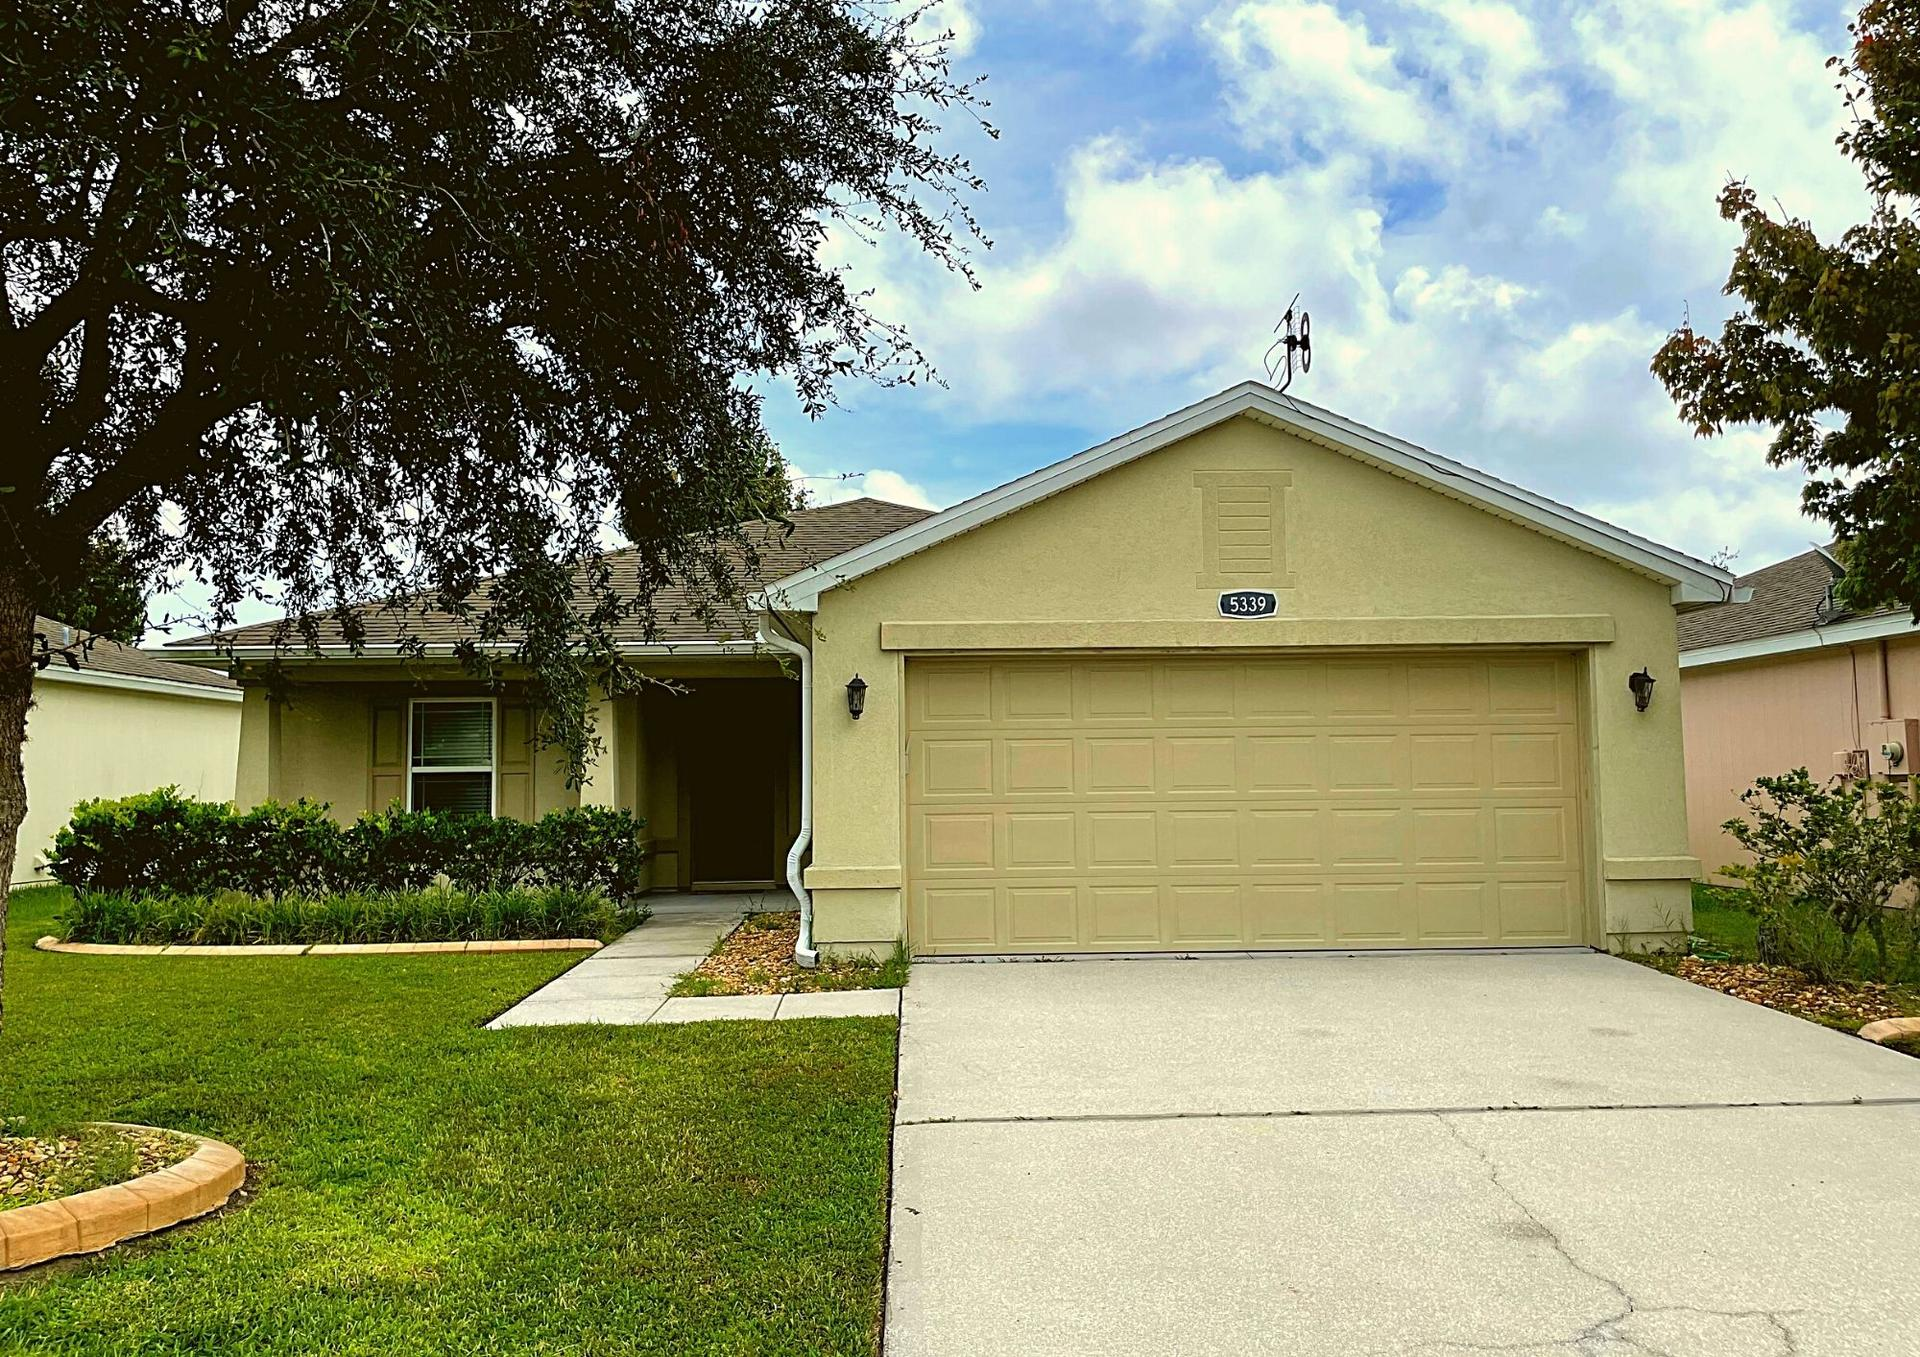 Photo of property: 5339 Peach Blossom Blvd, Port Orange, FL 32128